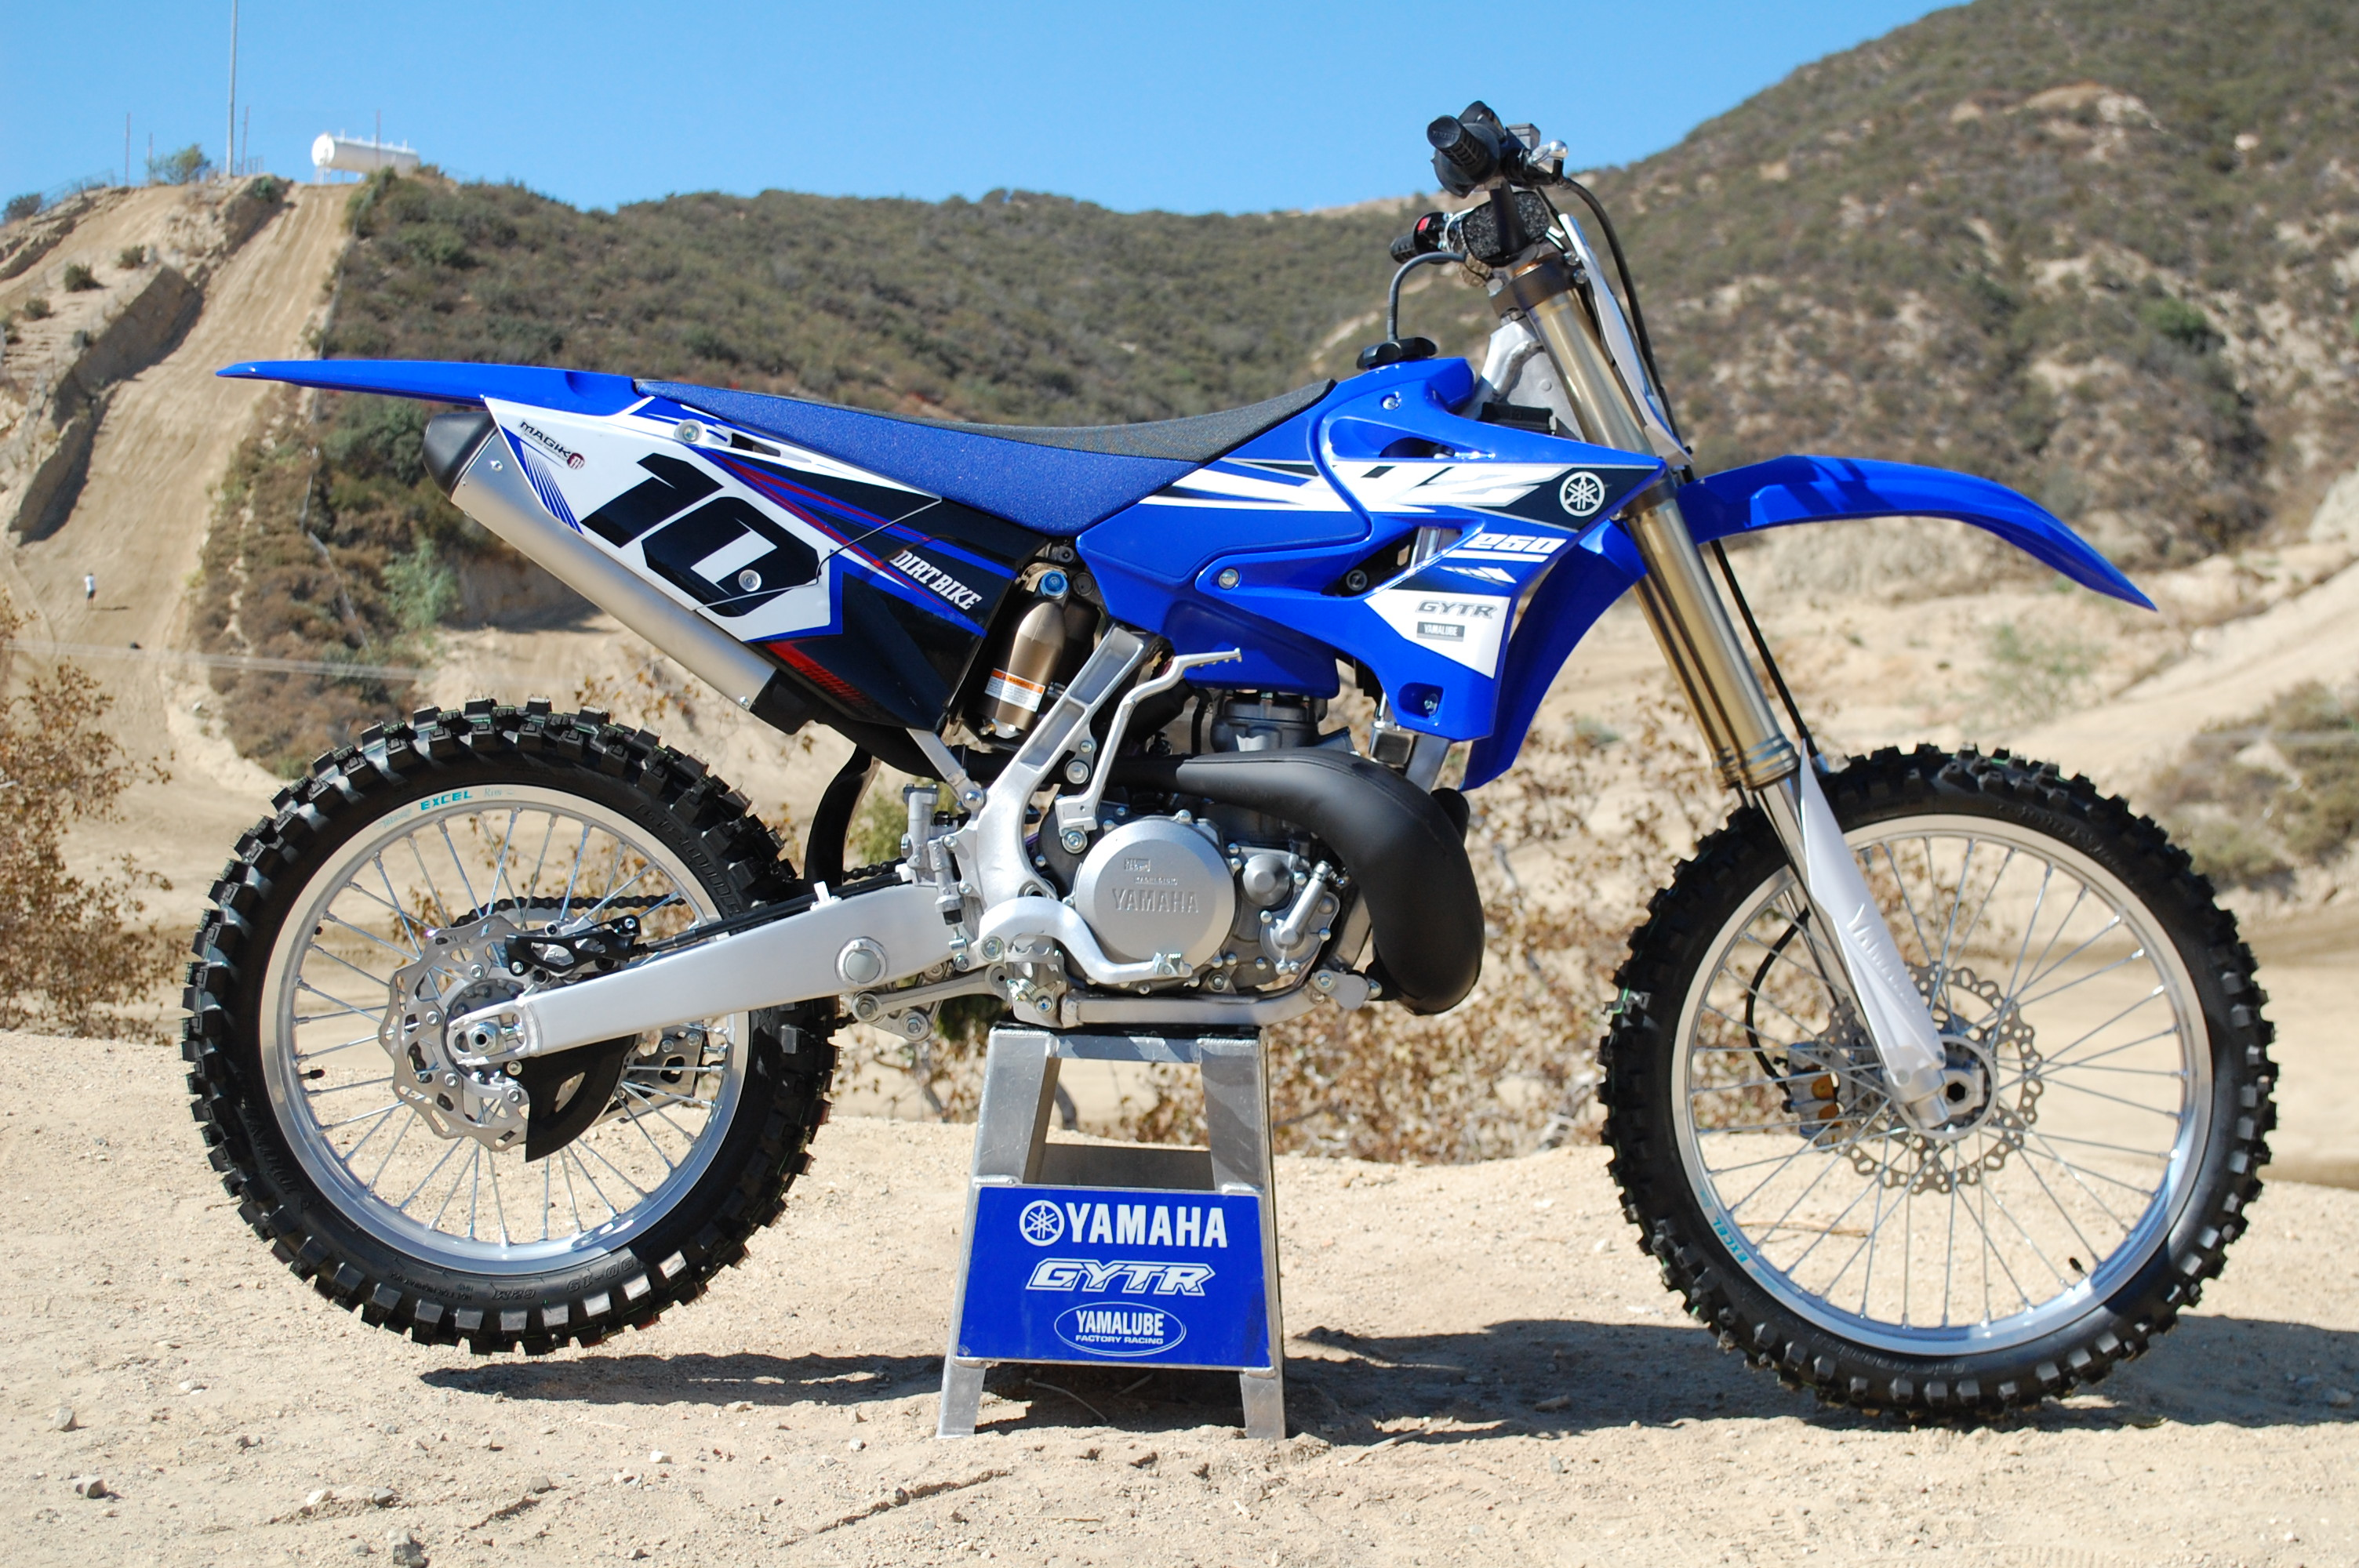 yamaha dirt bikes. dsc_0024 dsc_0038 dsc_0012 dsc_0010 yamaha dirt bikes y